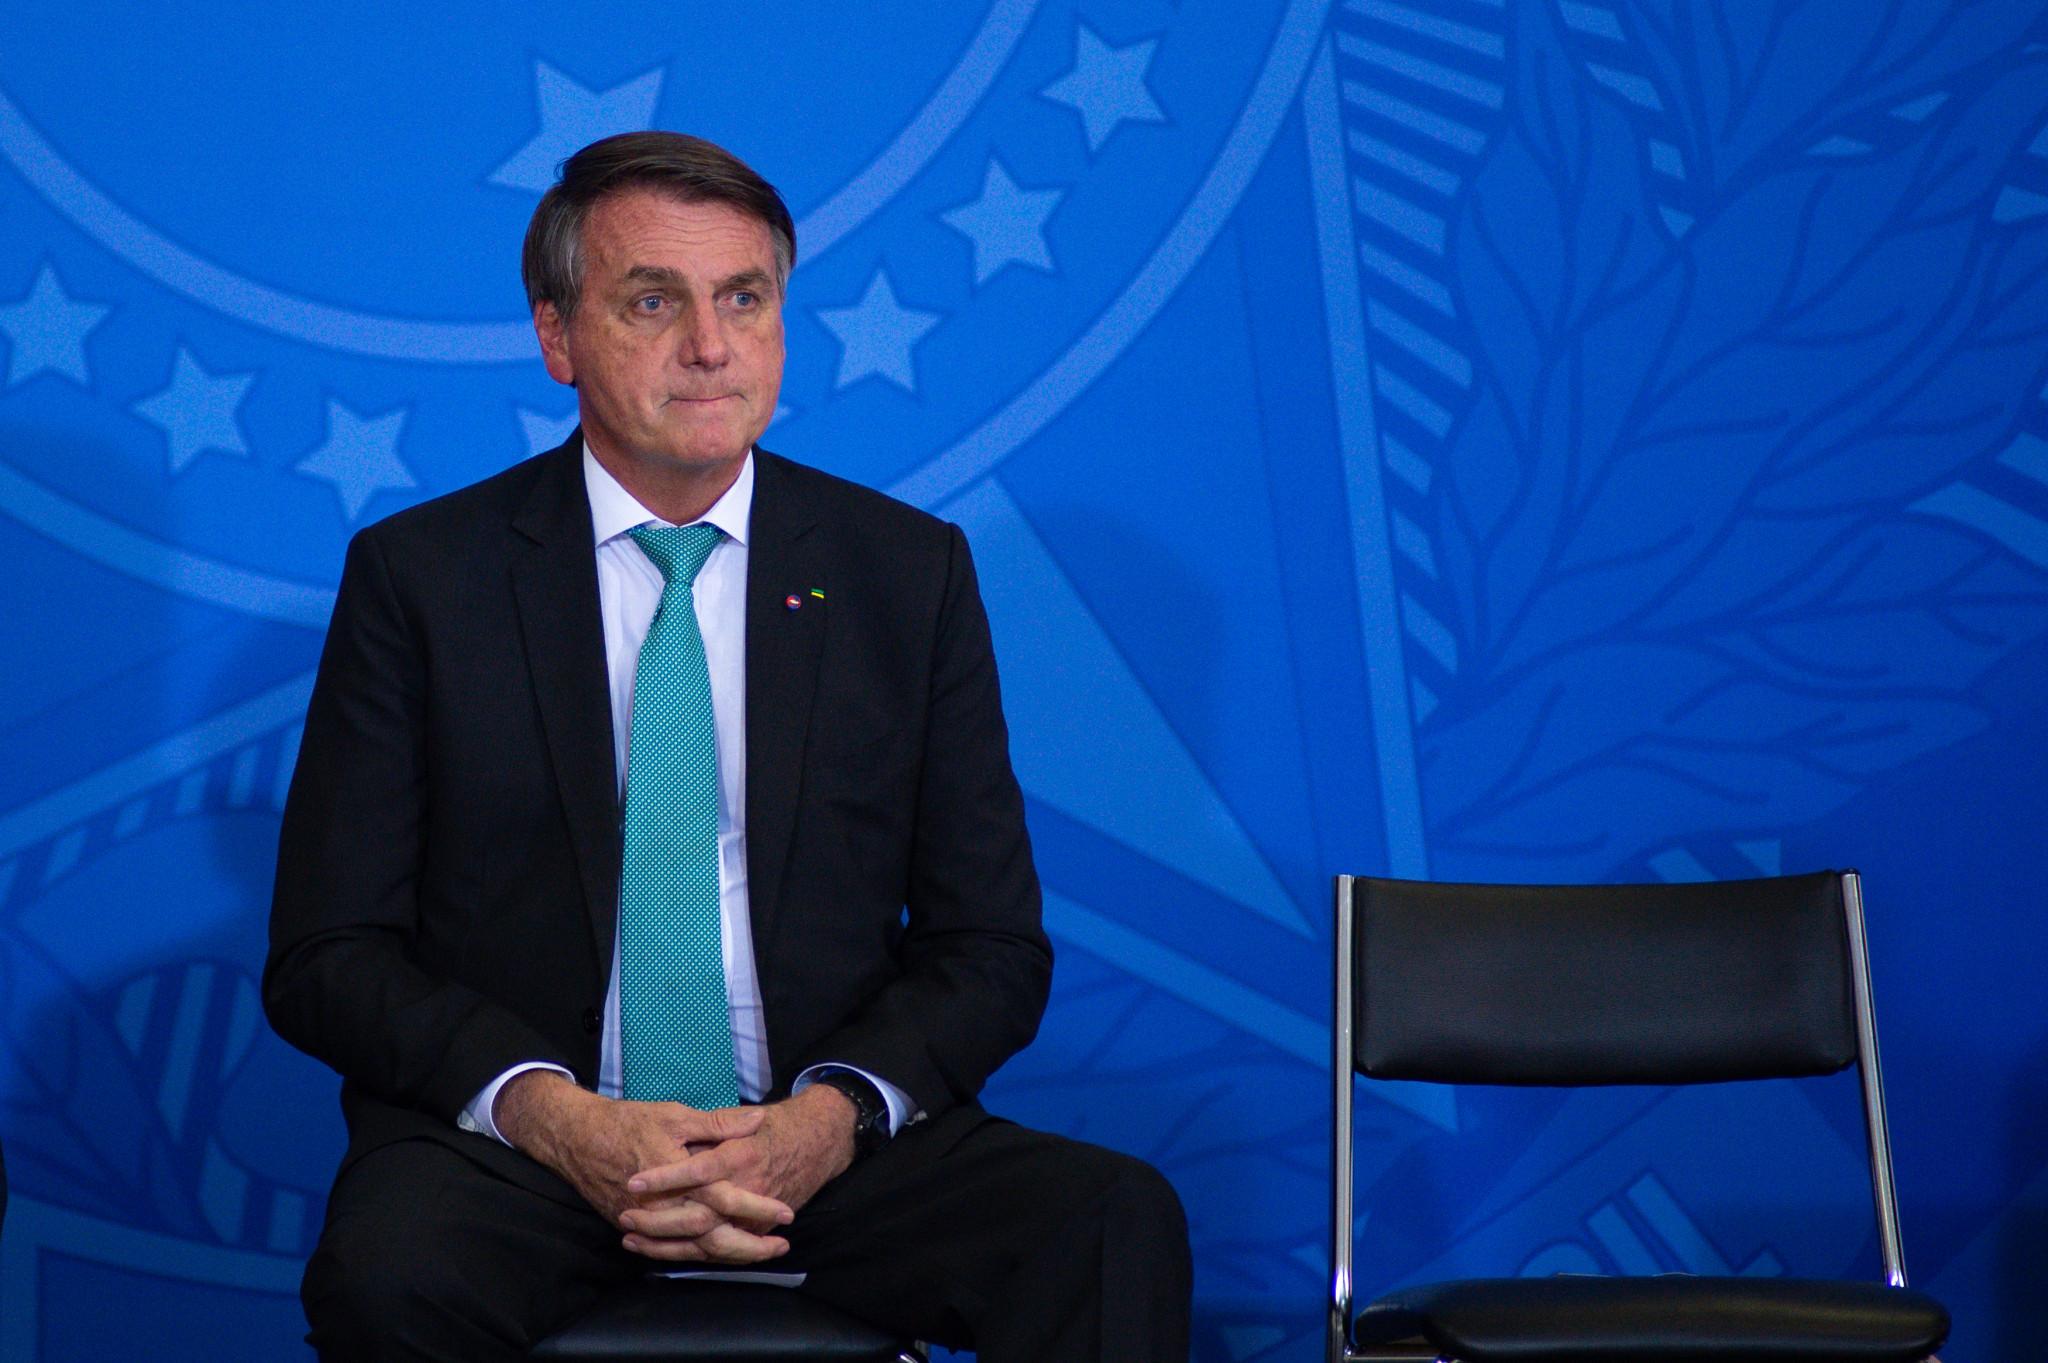 Unvaccinated Brazilian President Bolsonaro refused entry to Santos football match